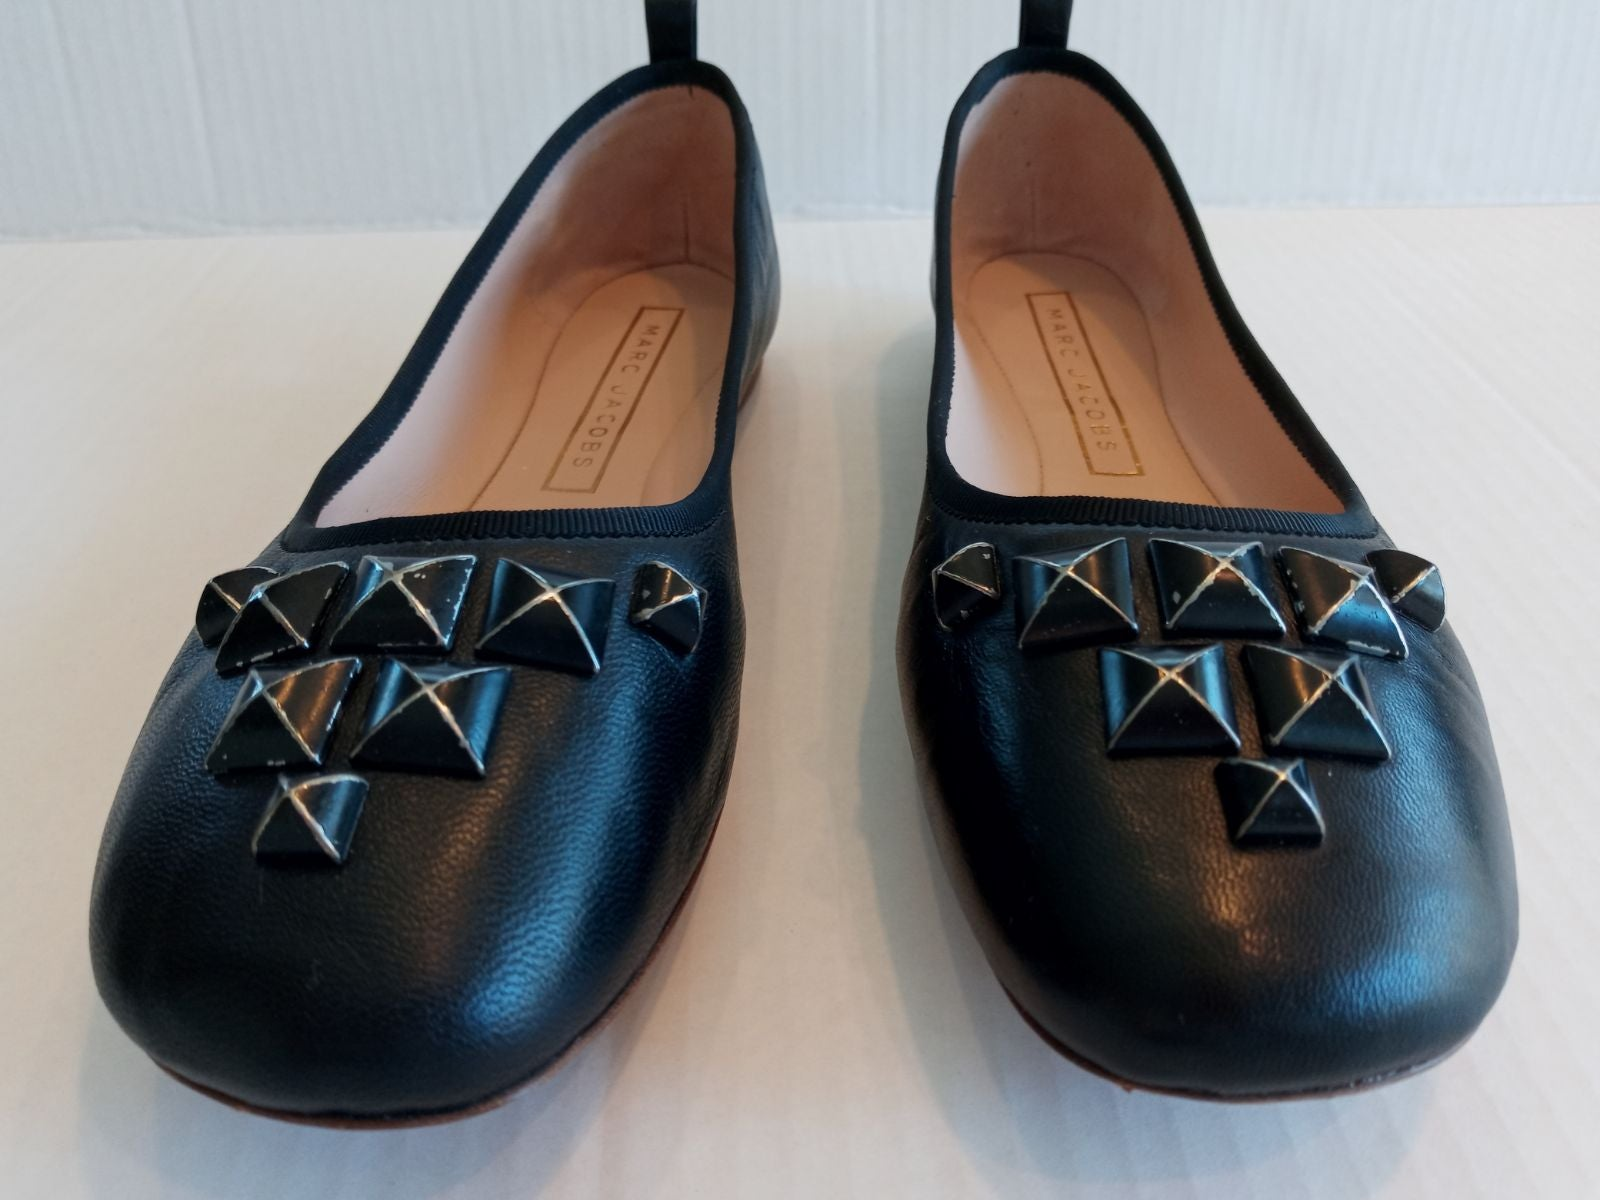 Marc Jacobs Cleo Flats - Size 8